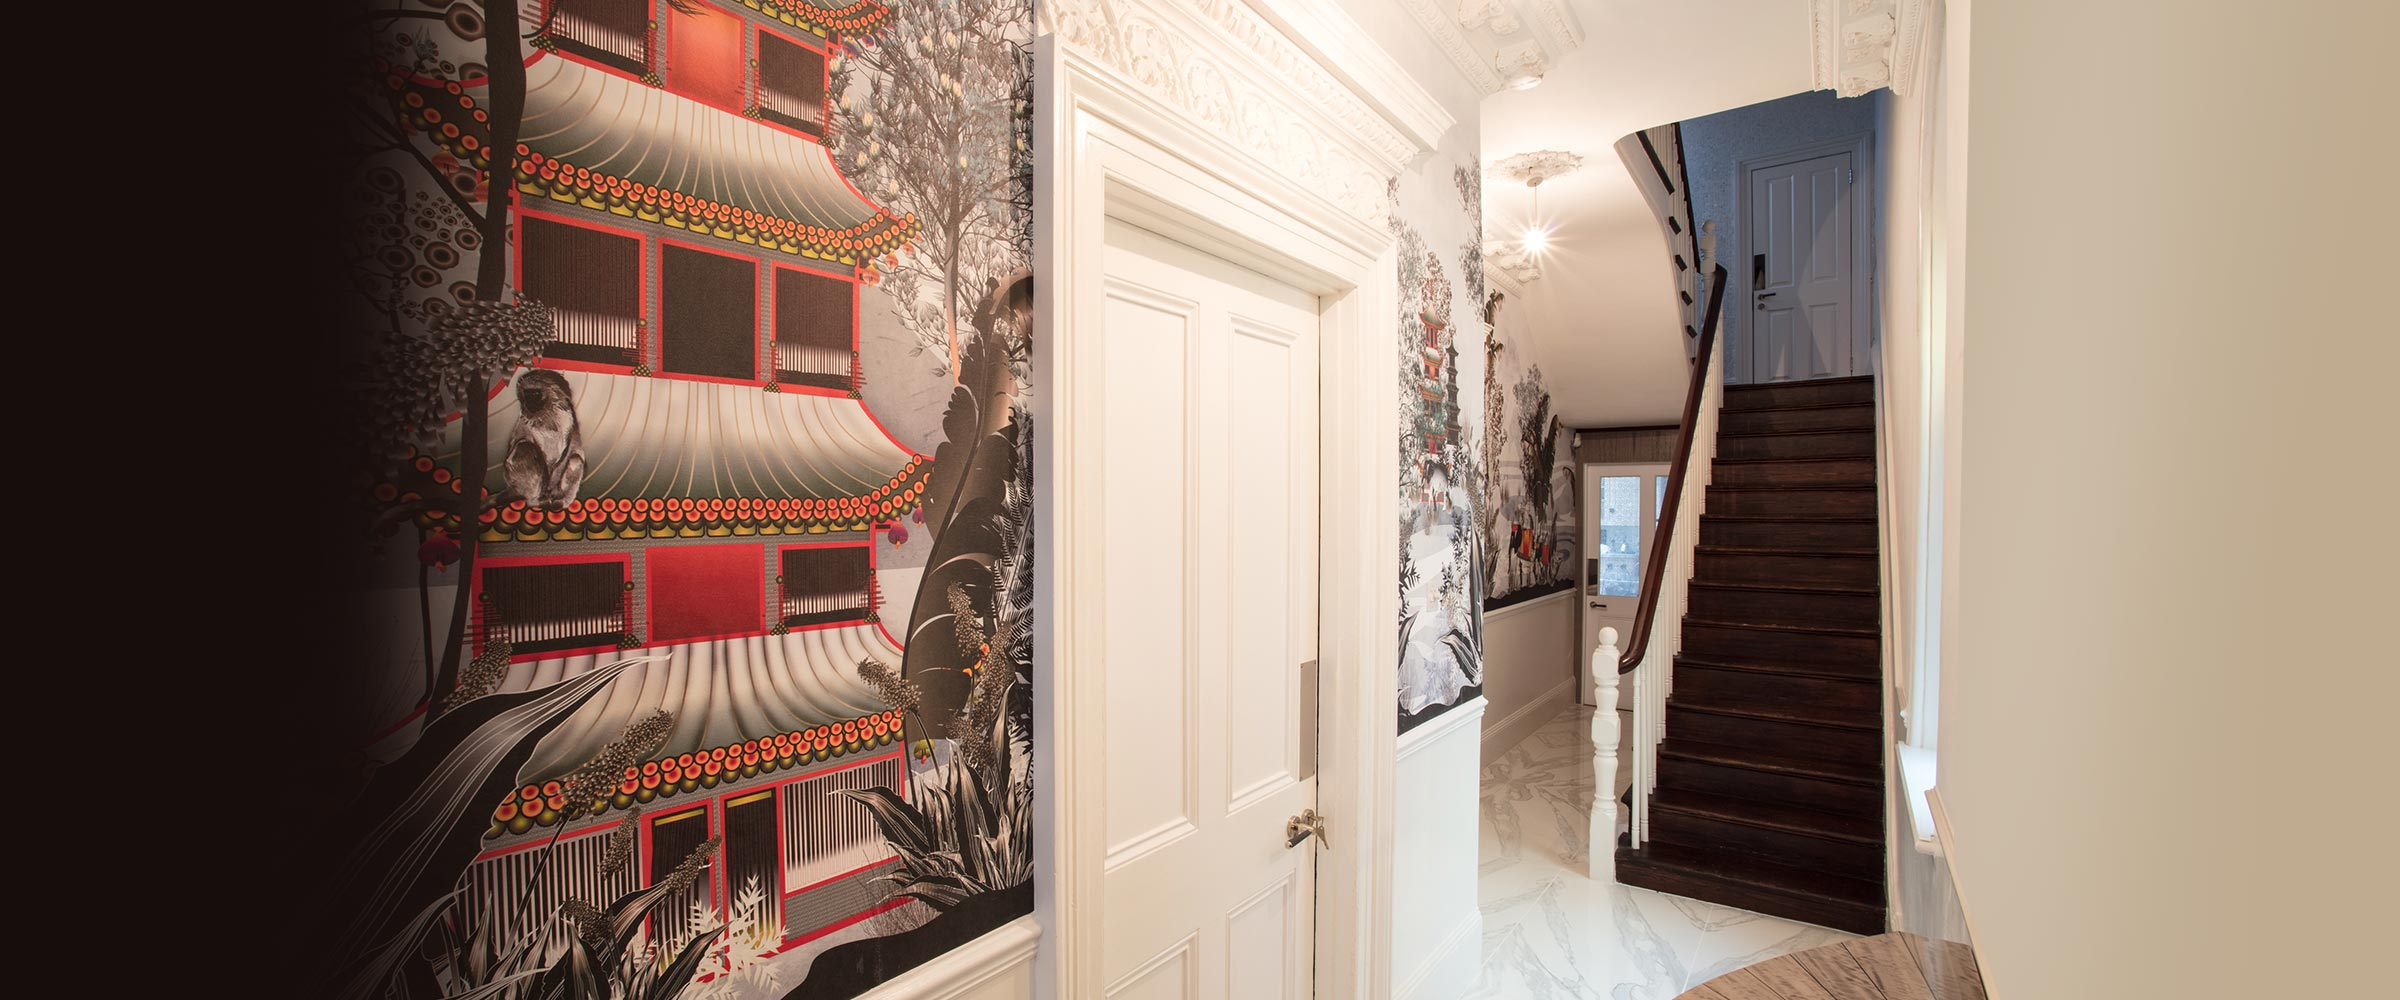 Hallway wallpaper by Modern Love